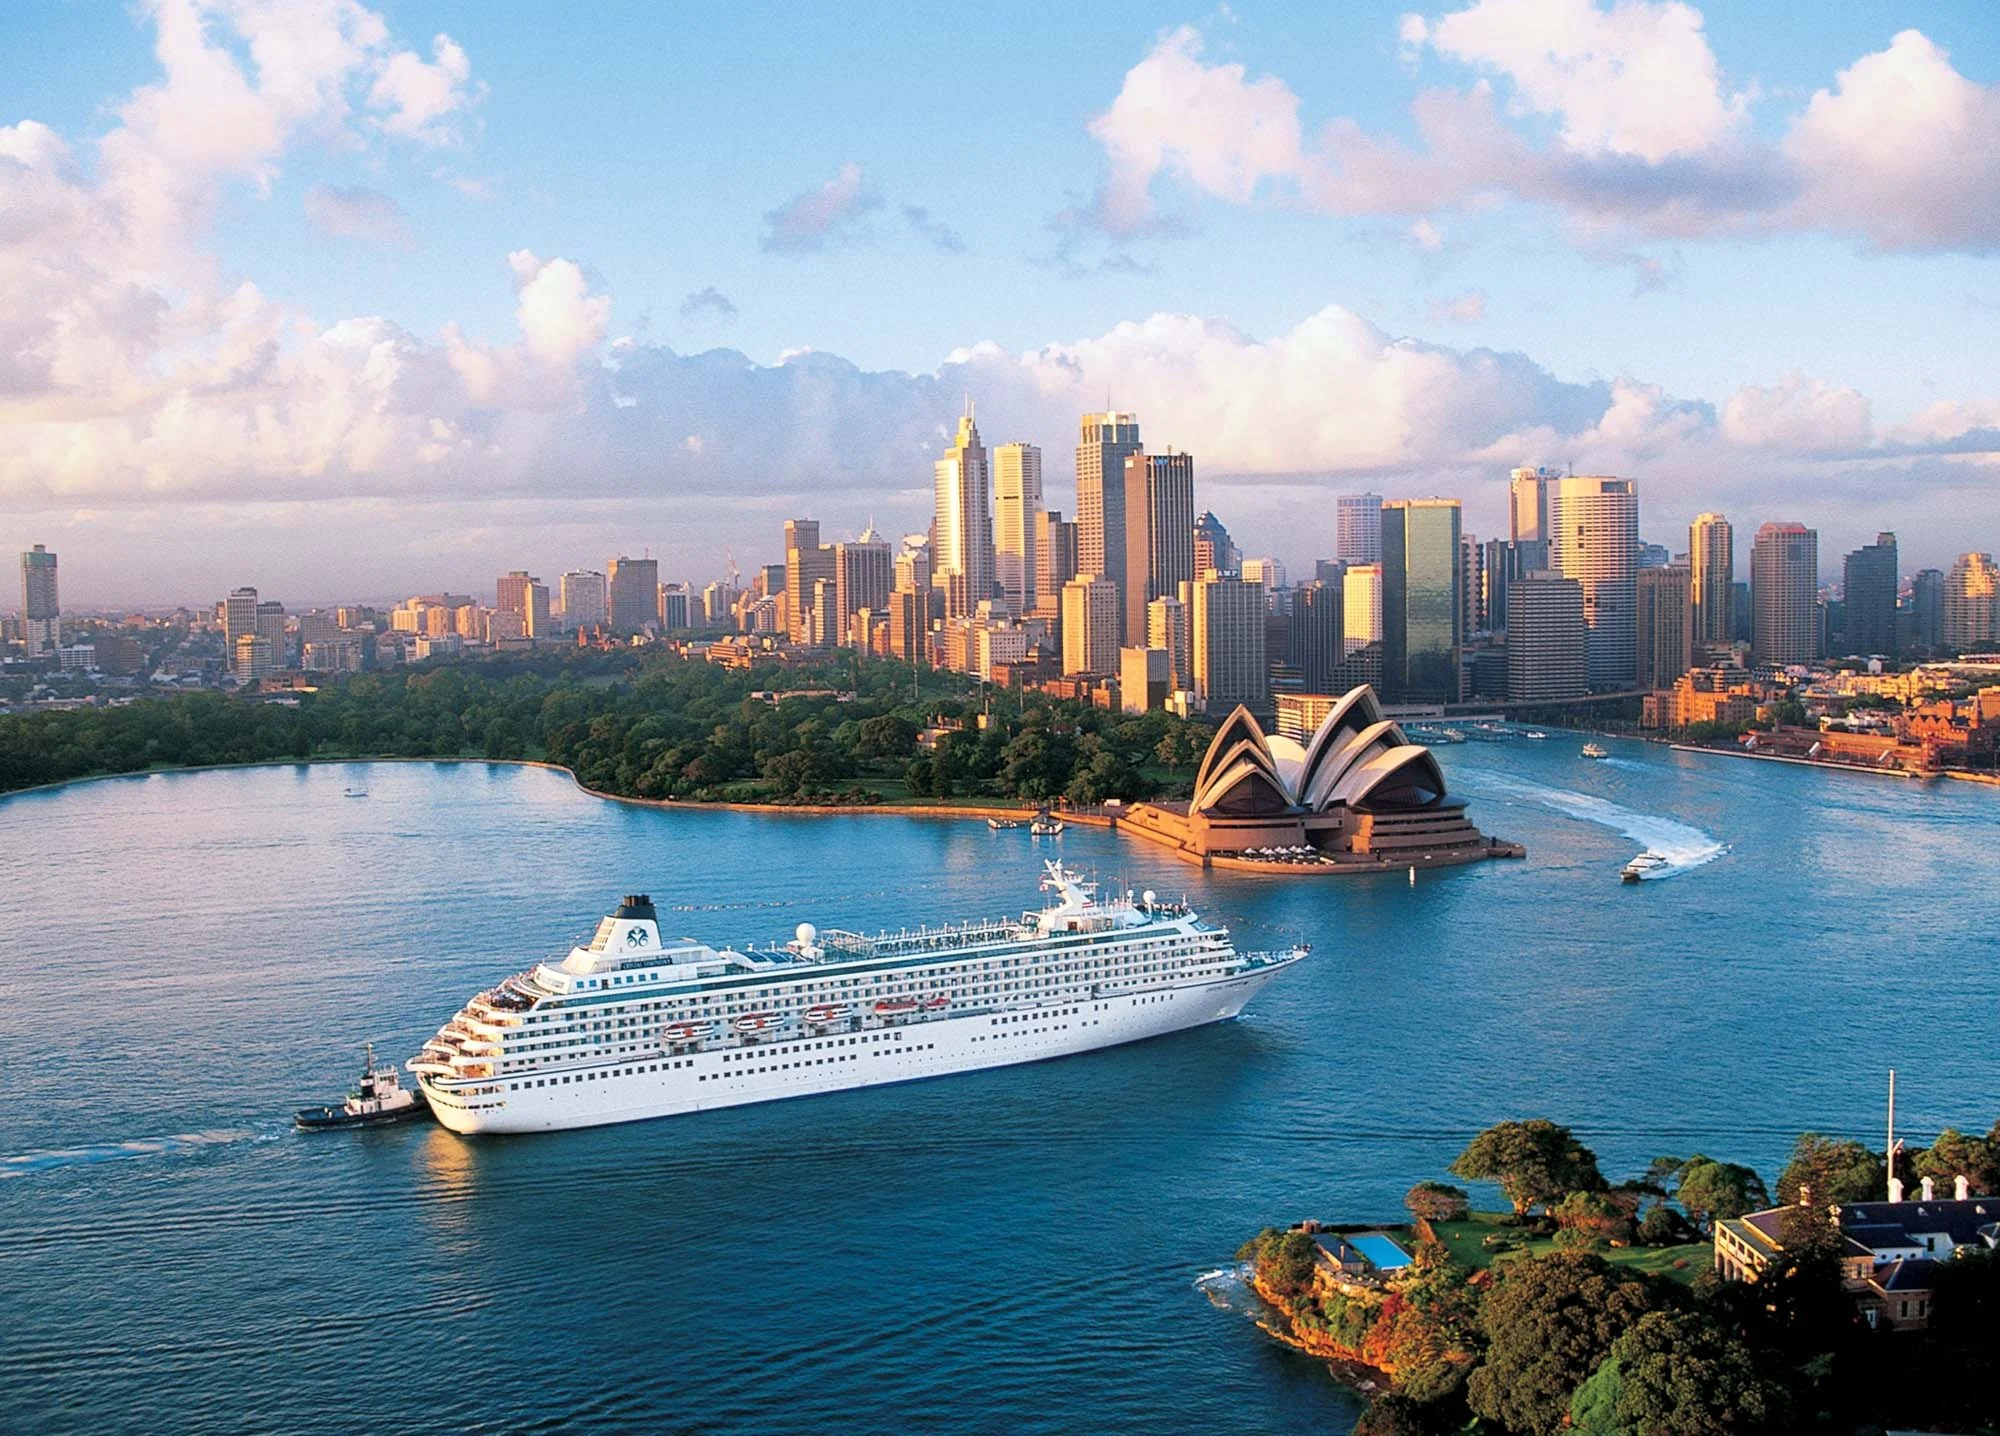 Visiting Australia: Is Sydney or Melbourne better?